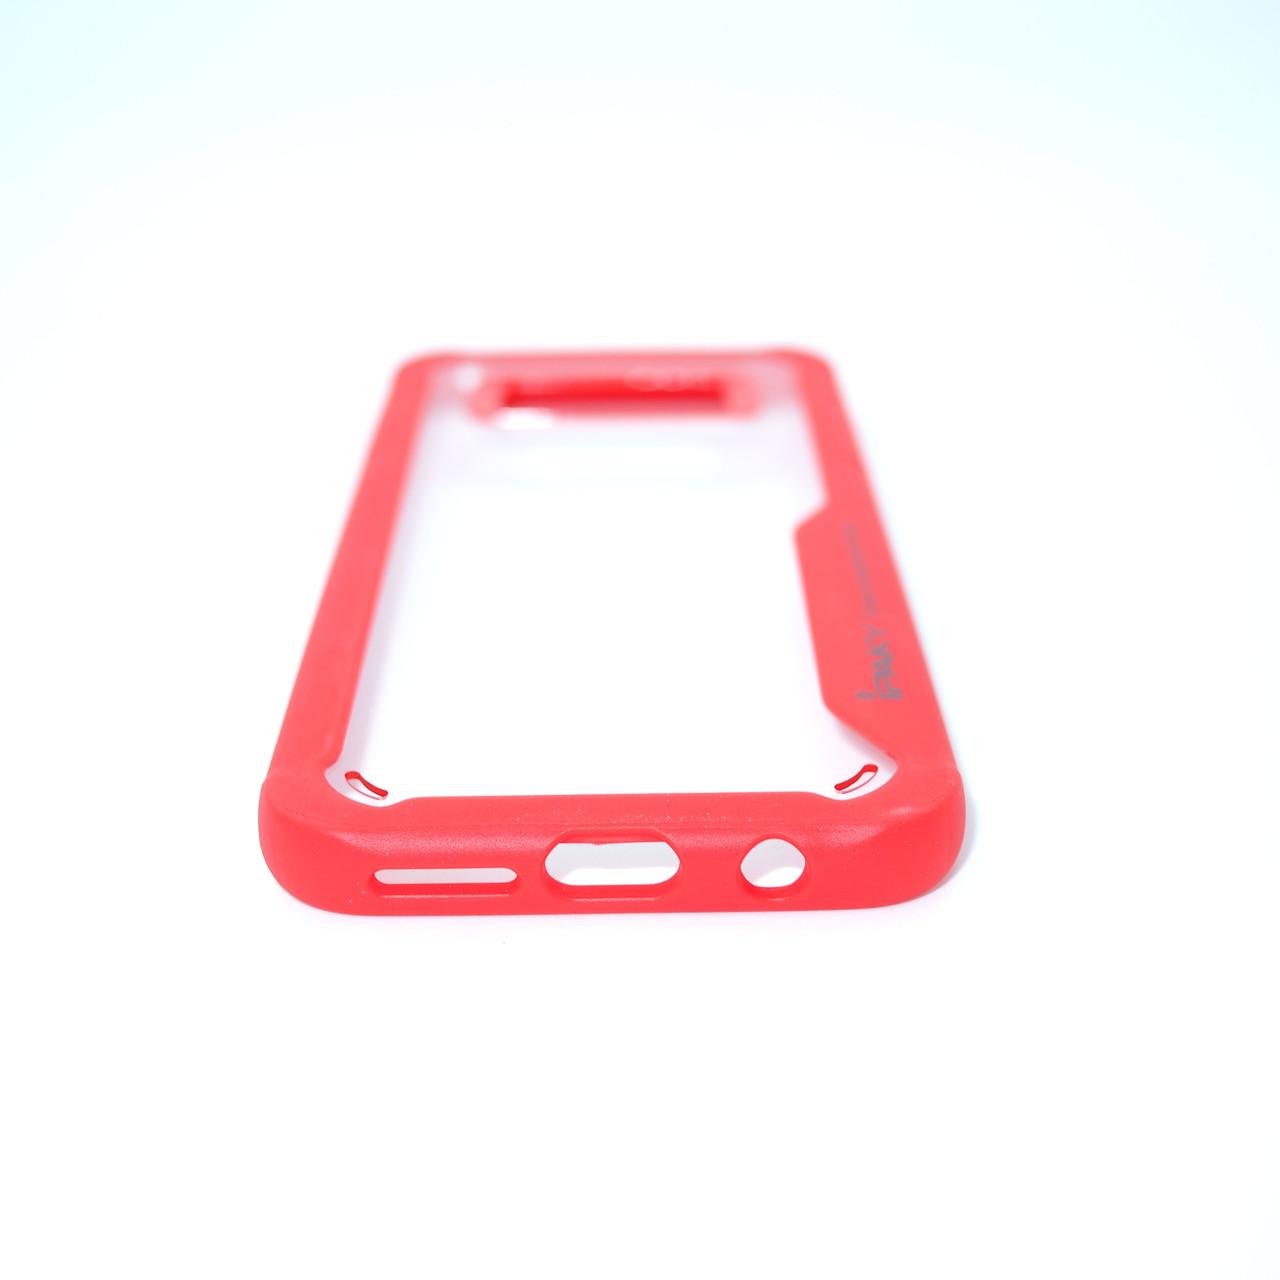 Чехол iPaky Survival Samsung Galaxy S8 G950 red Для телефона Красный